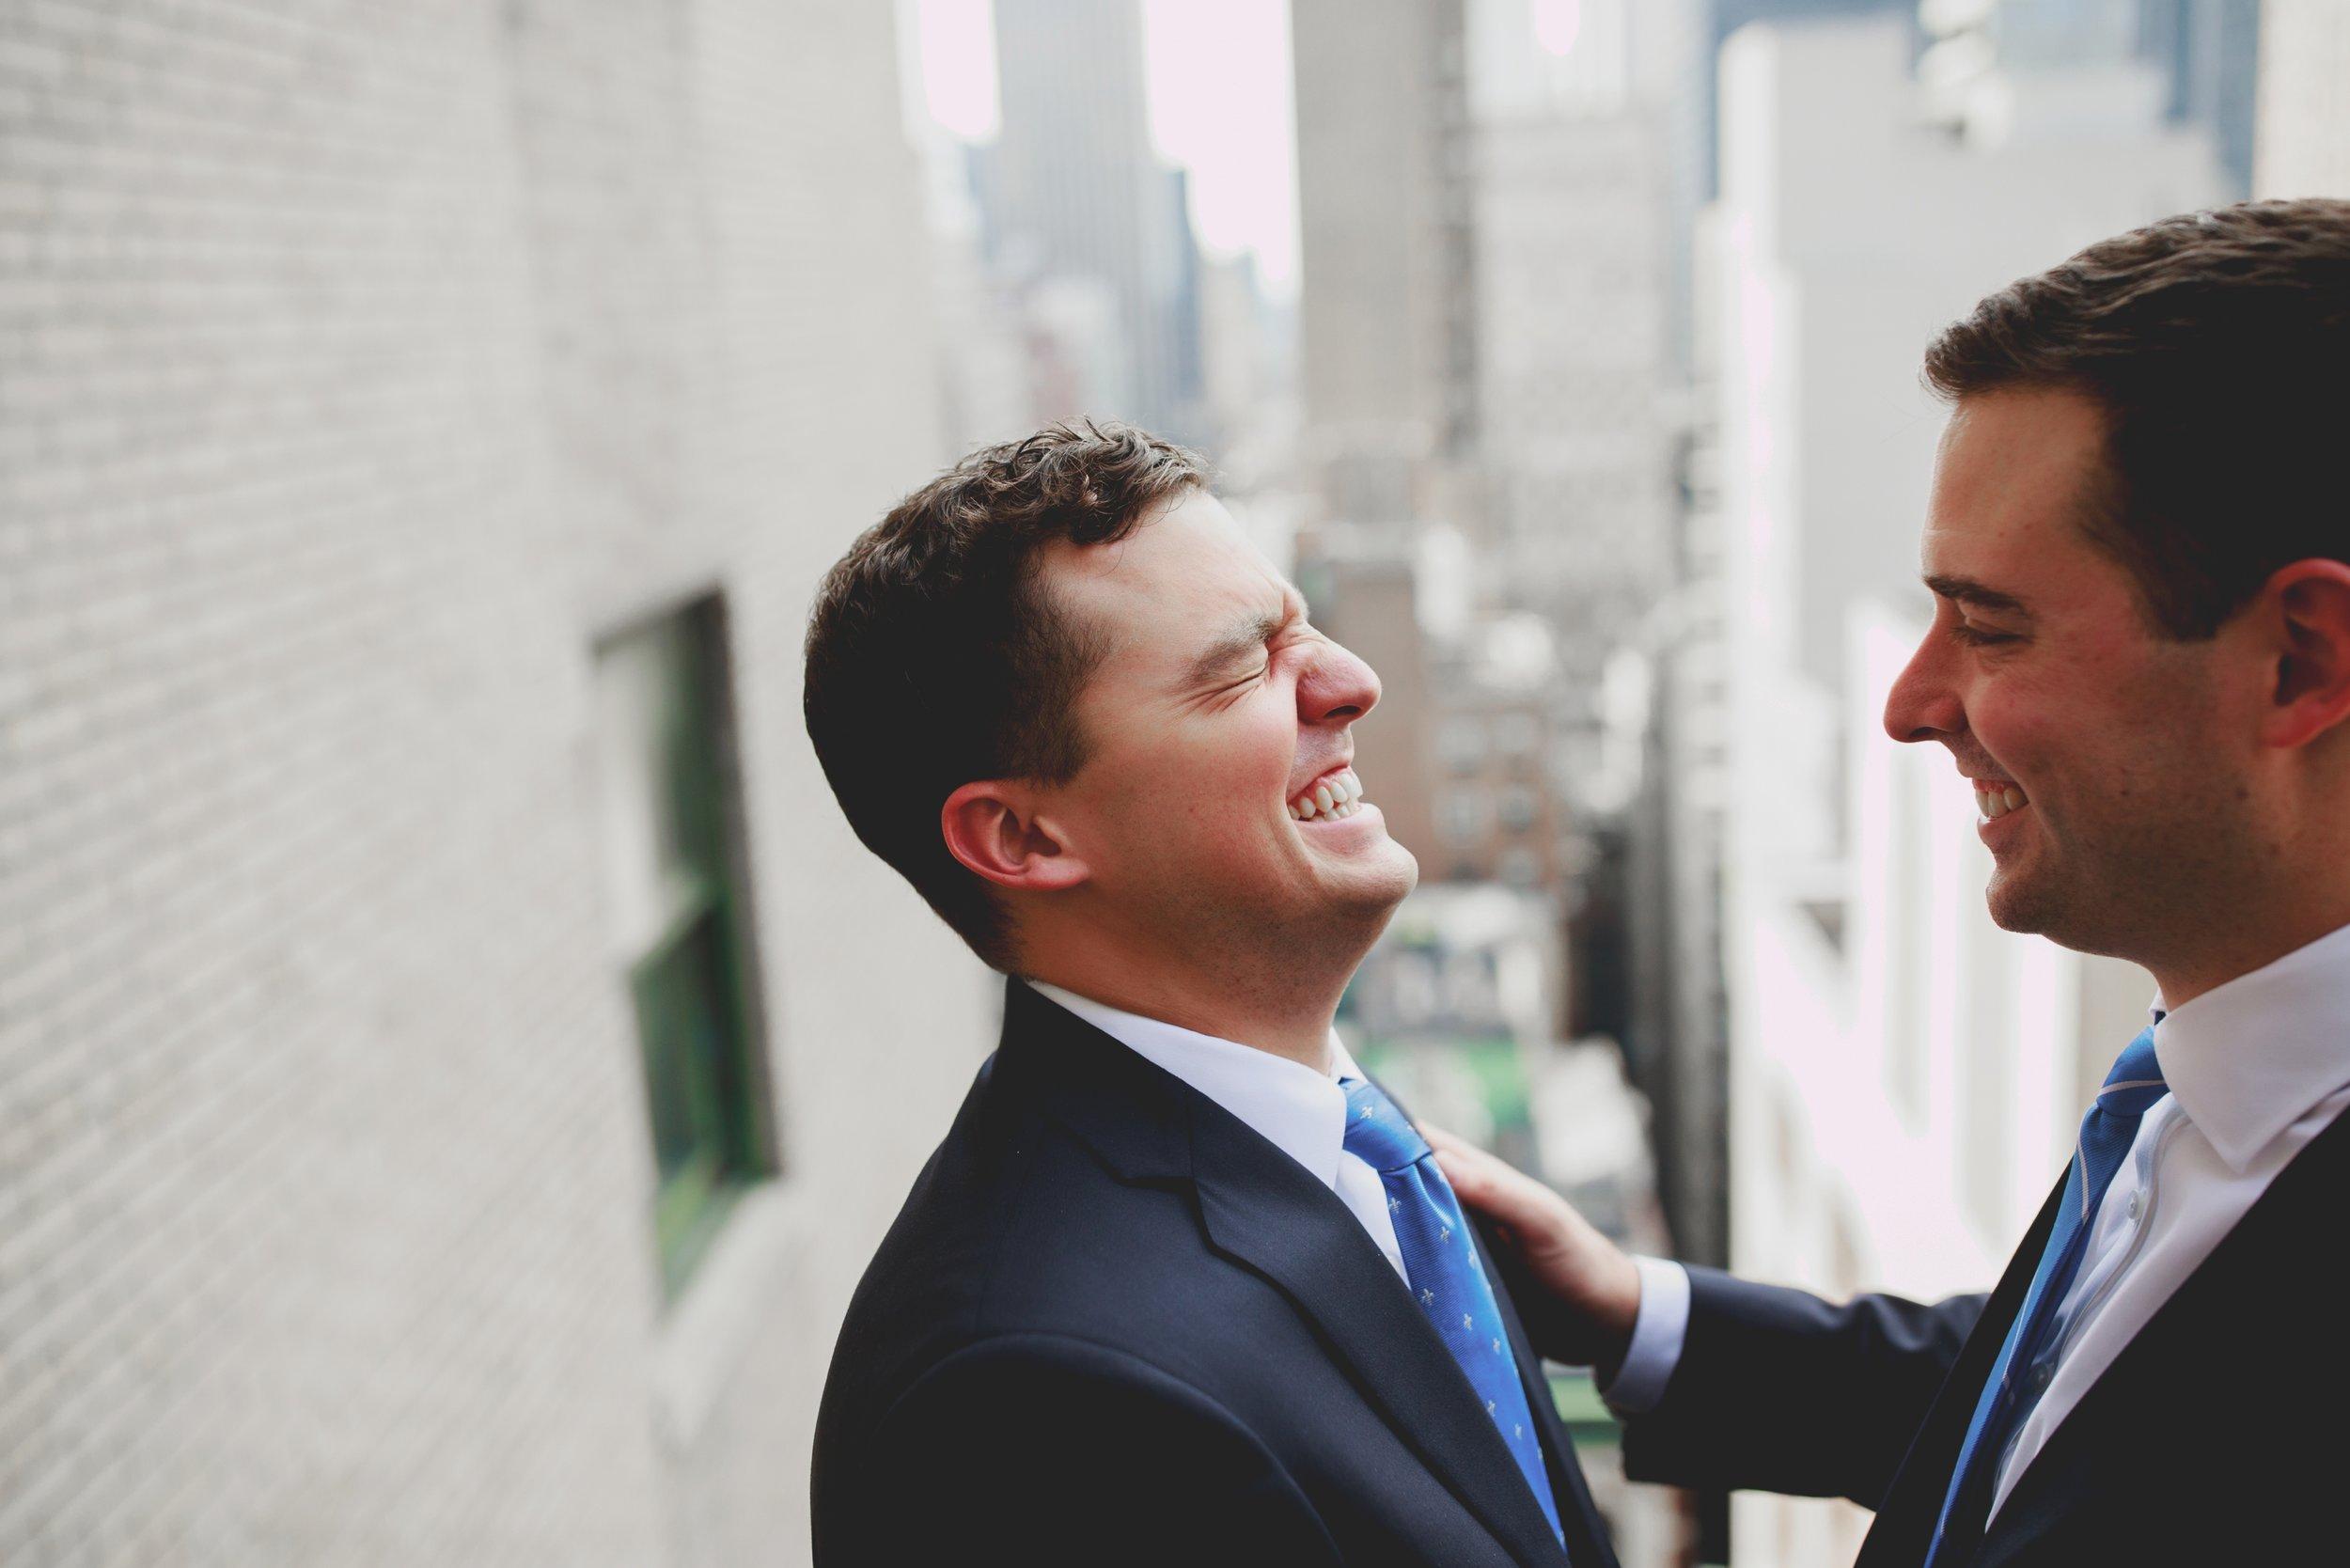 amanda_vanvels_new_york_lgbtq_gay_wedding_031.jpg